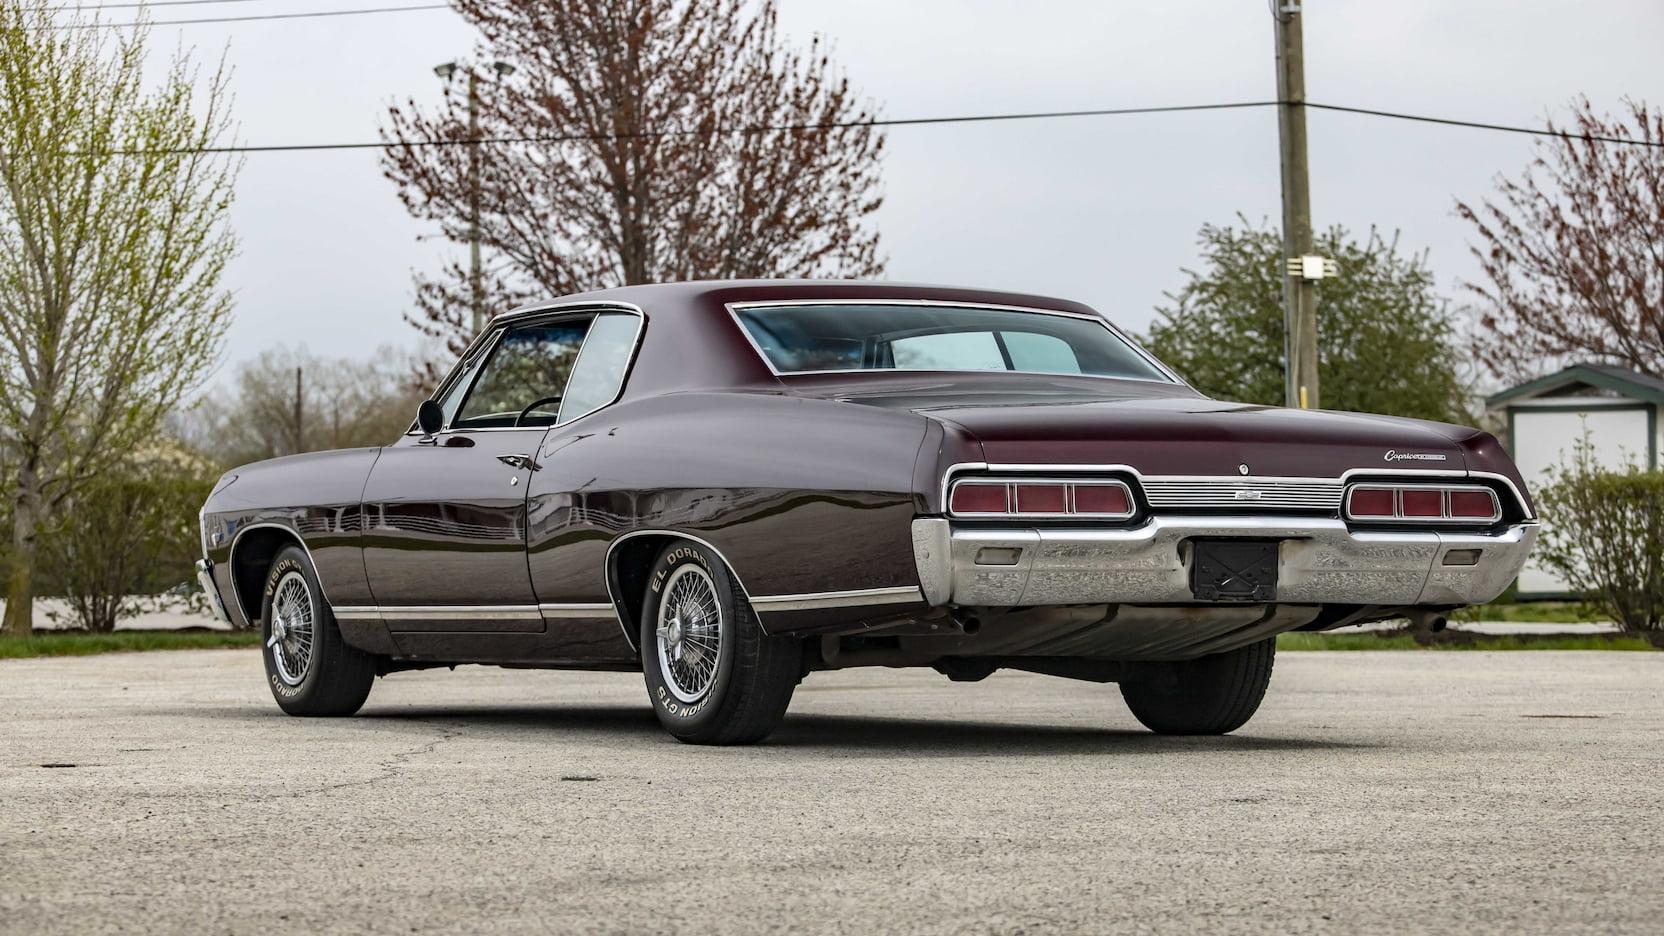 1967 Chevrolet Caprice rear 3/4